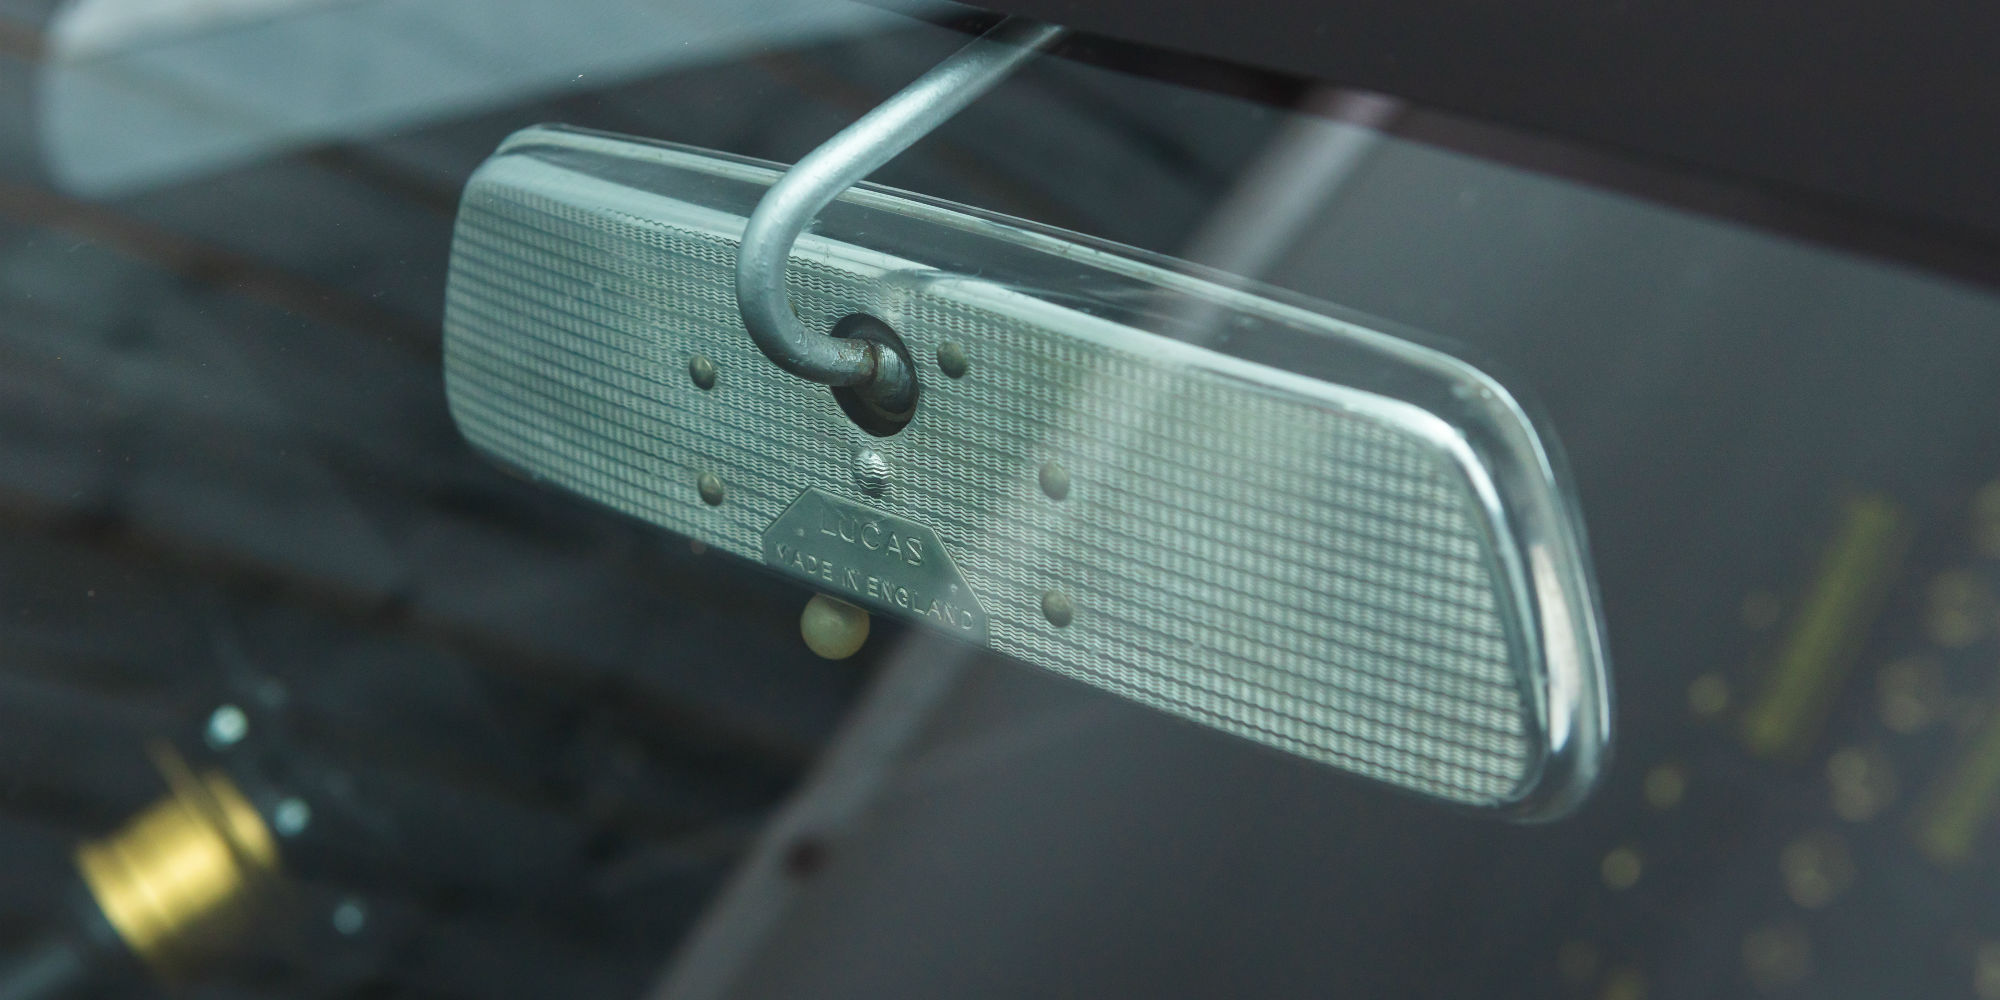 Gelscoe GT40 – FIA HTP, Test Miles Only